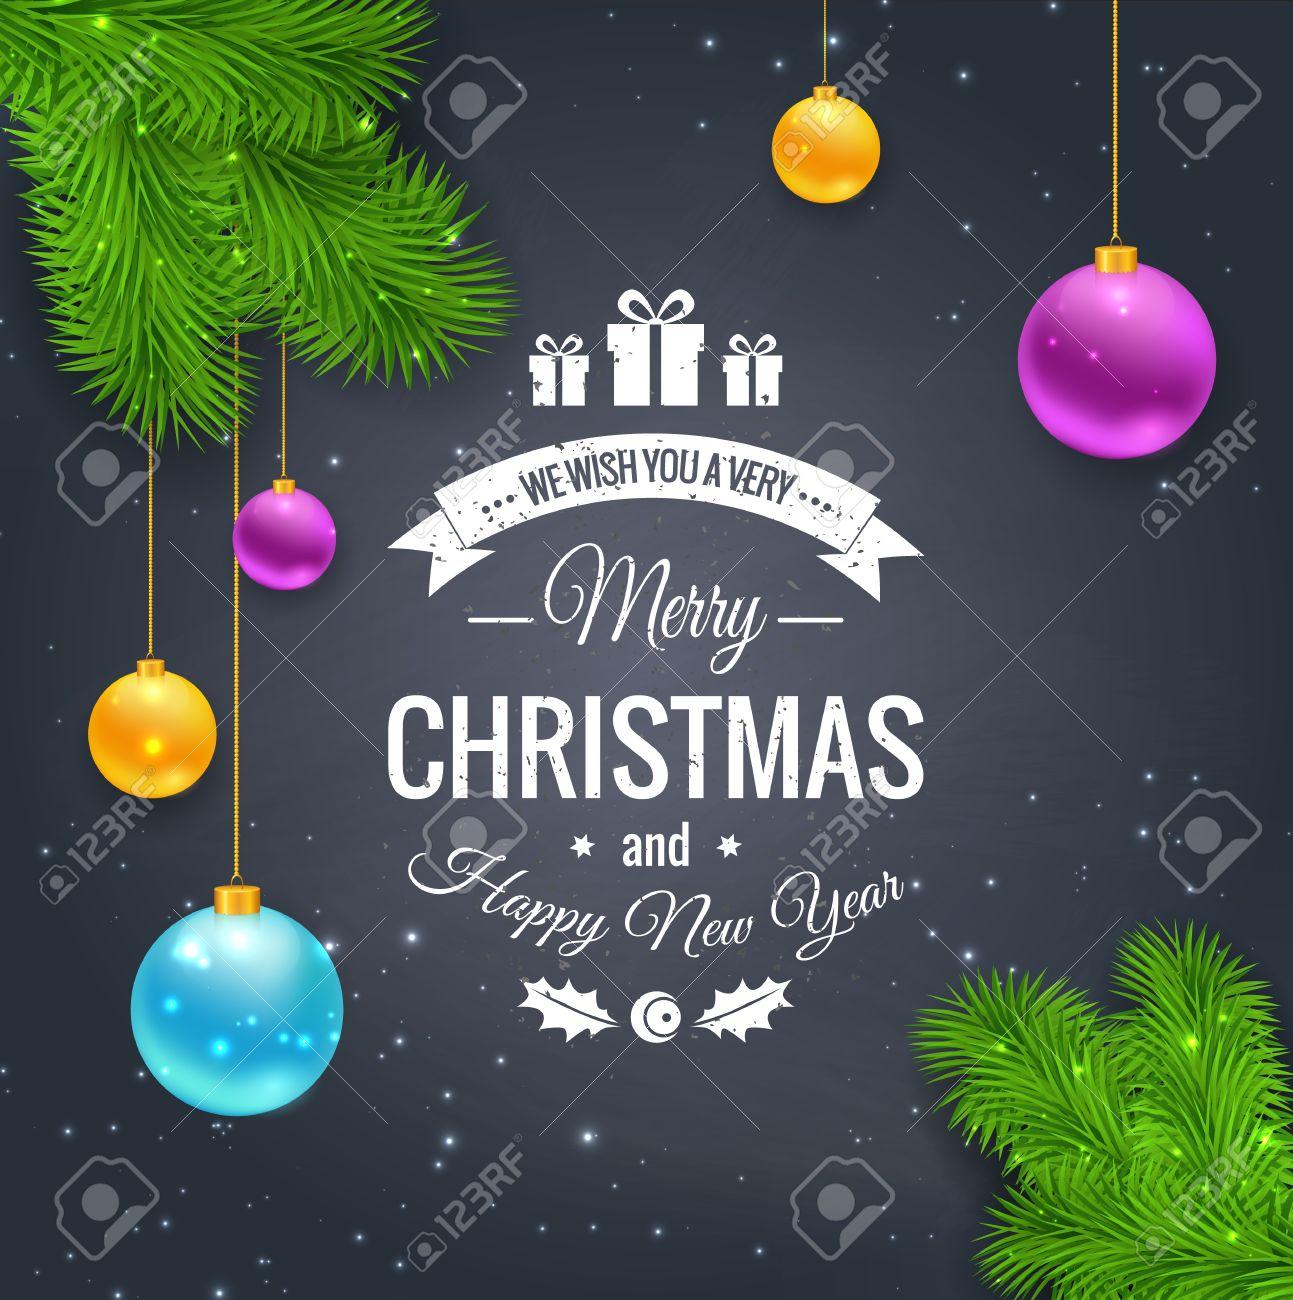 Merry Christmas Greetings Logo On Chalkboard Chrictmas Design